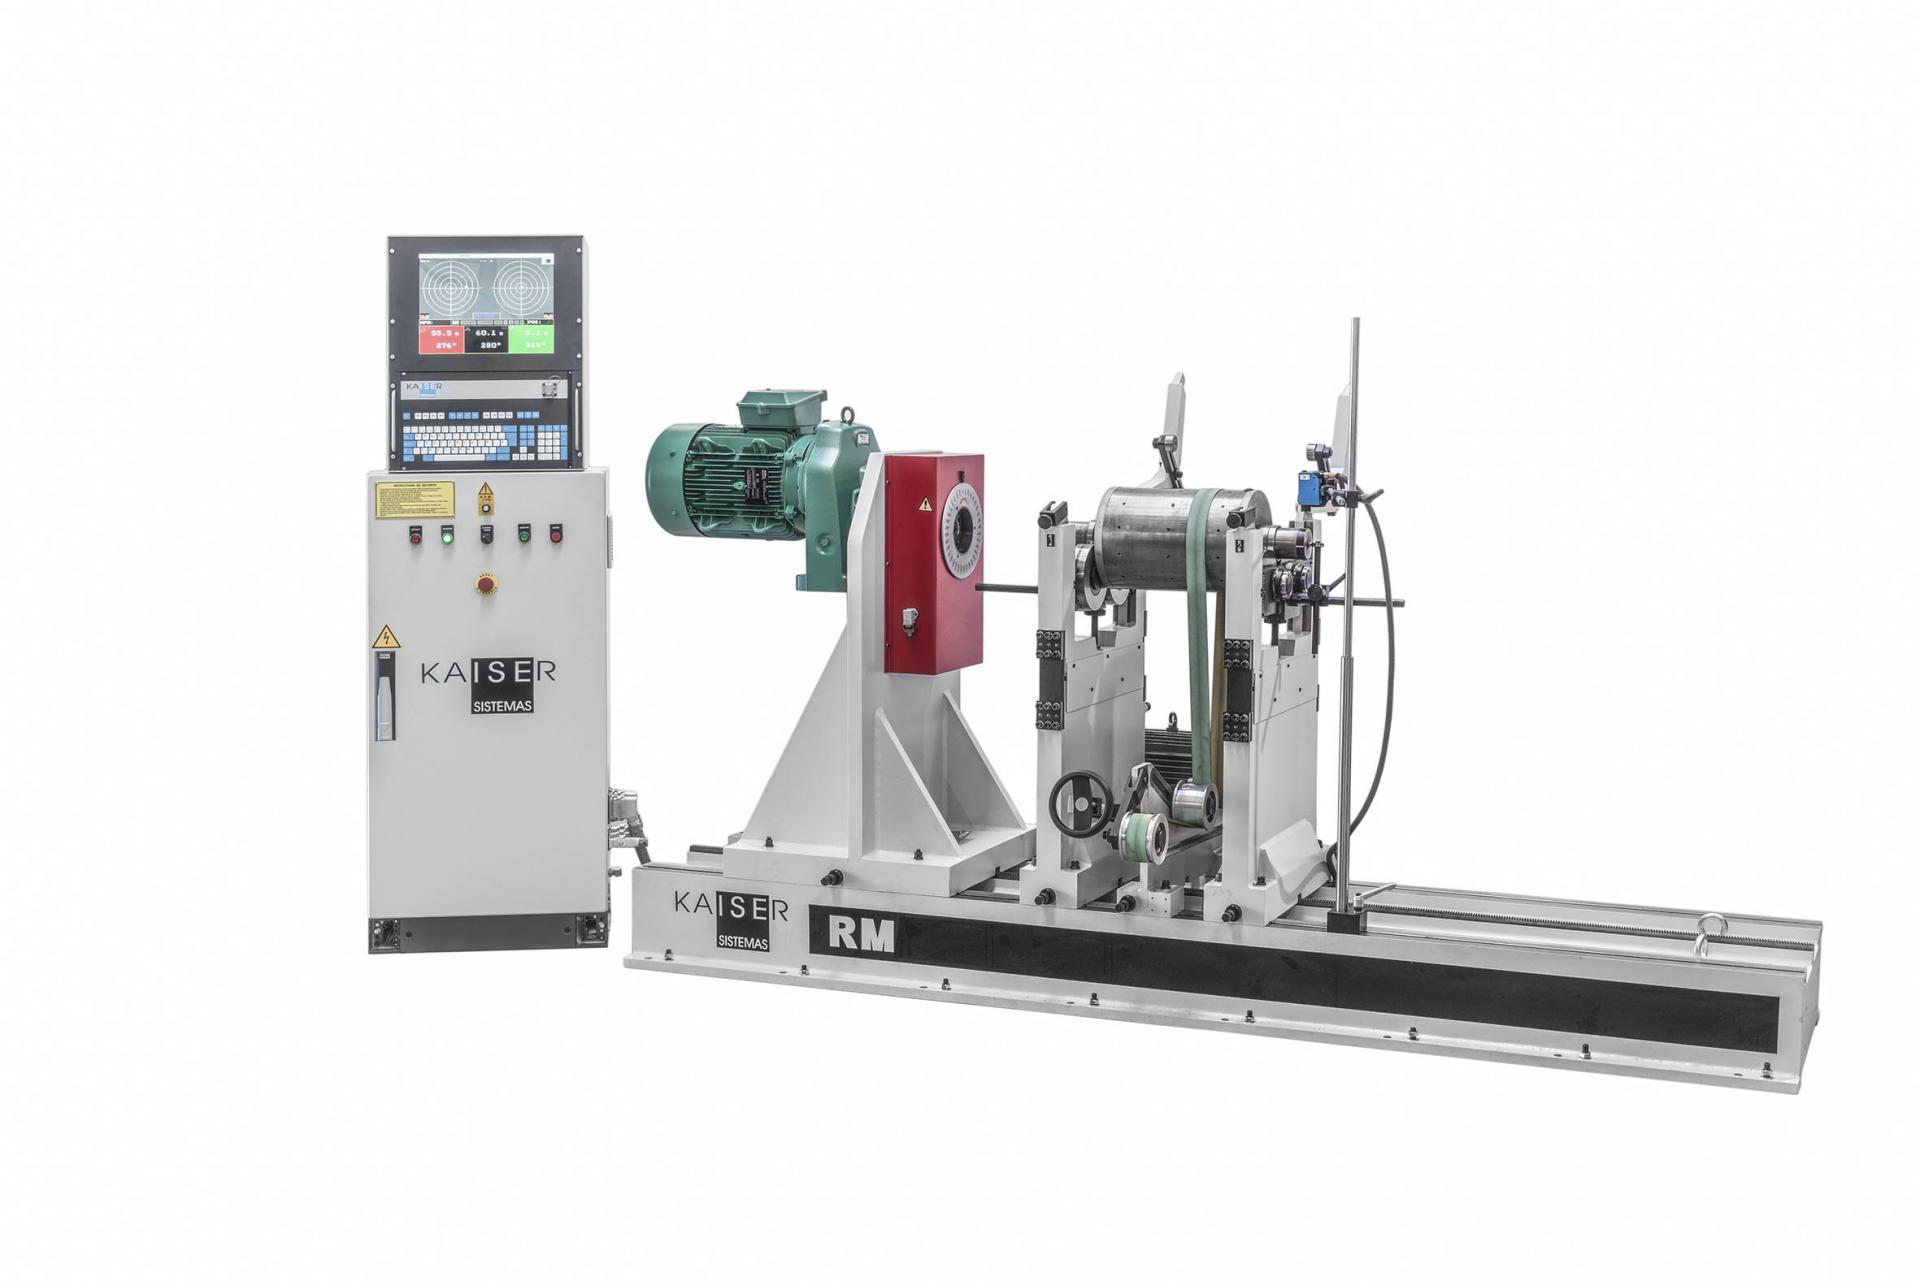 REF 13 - MODEL RM3000-4500.3 HORIZONTAL BALANCING MACHINE